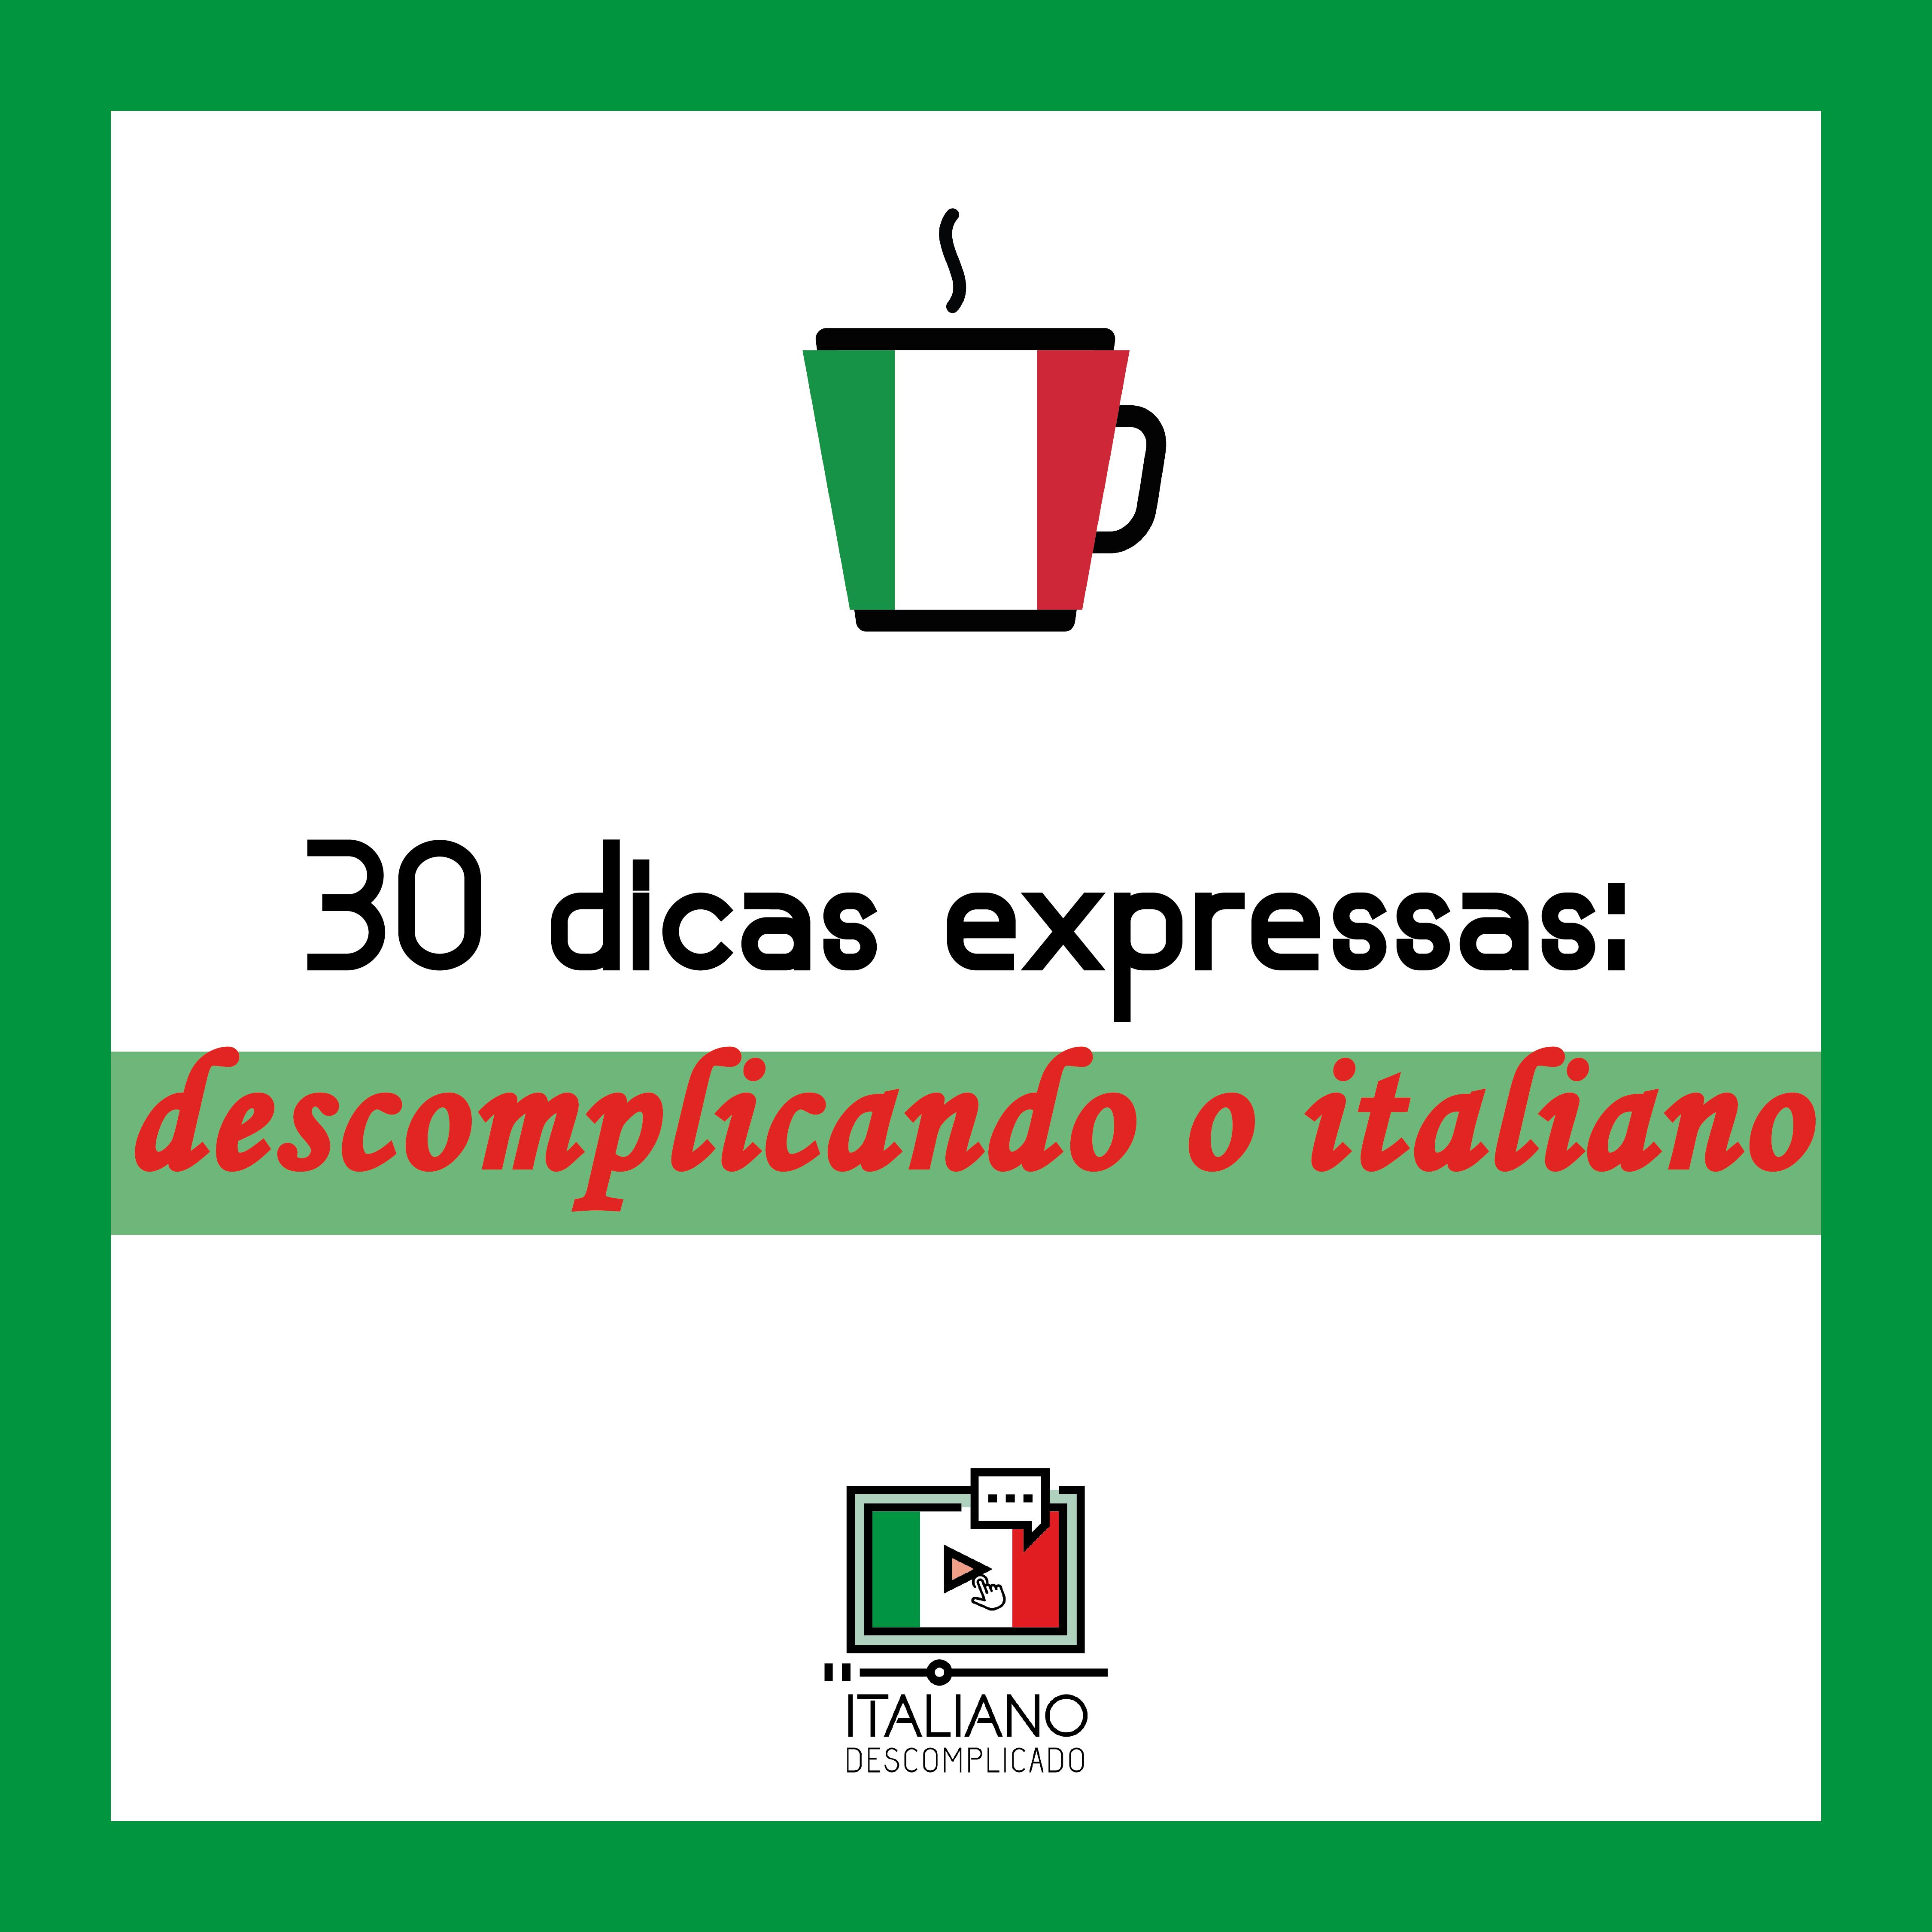 30 dicas expressas: descomplicando o italiano